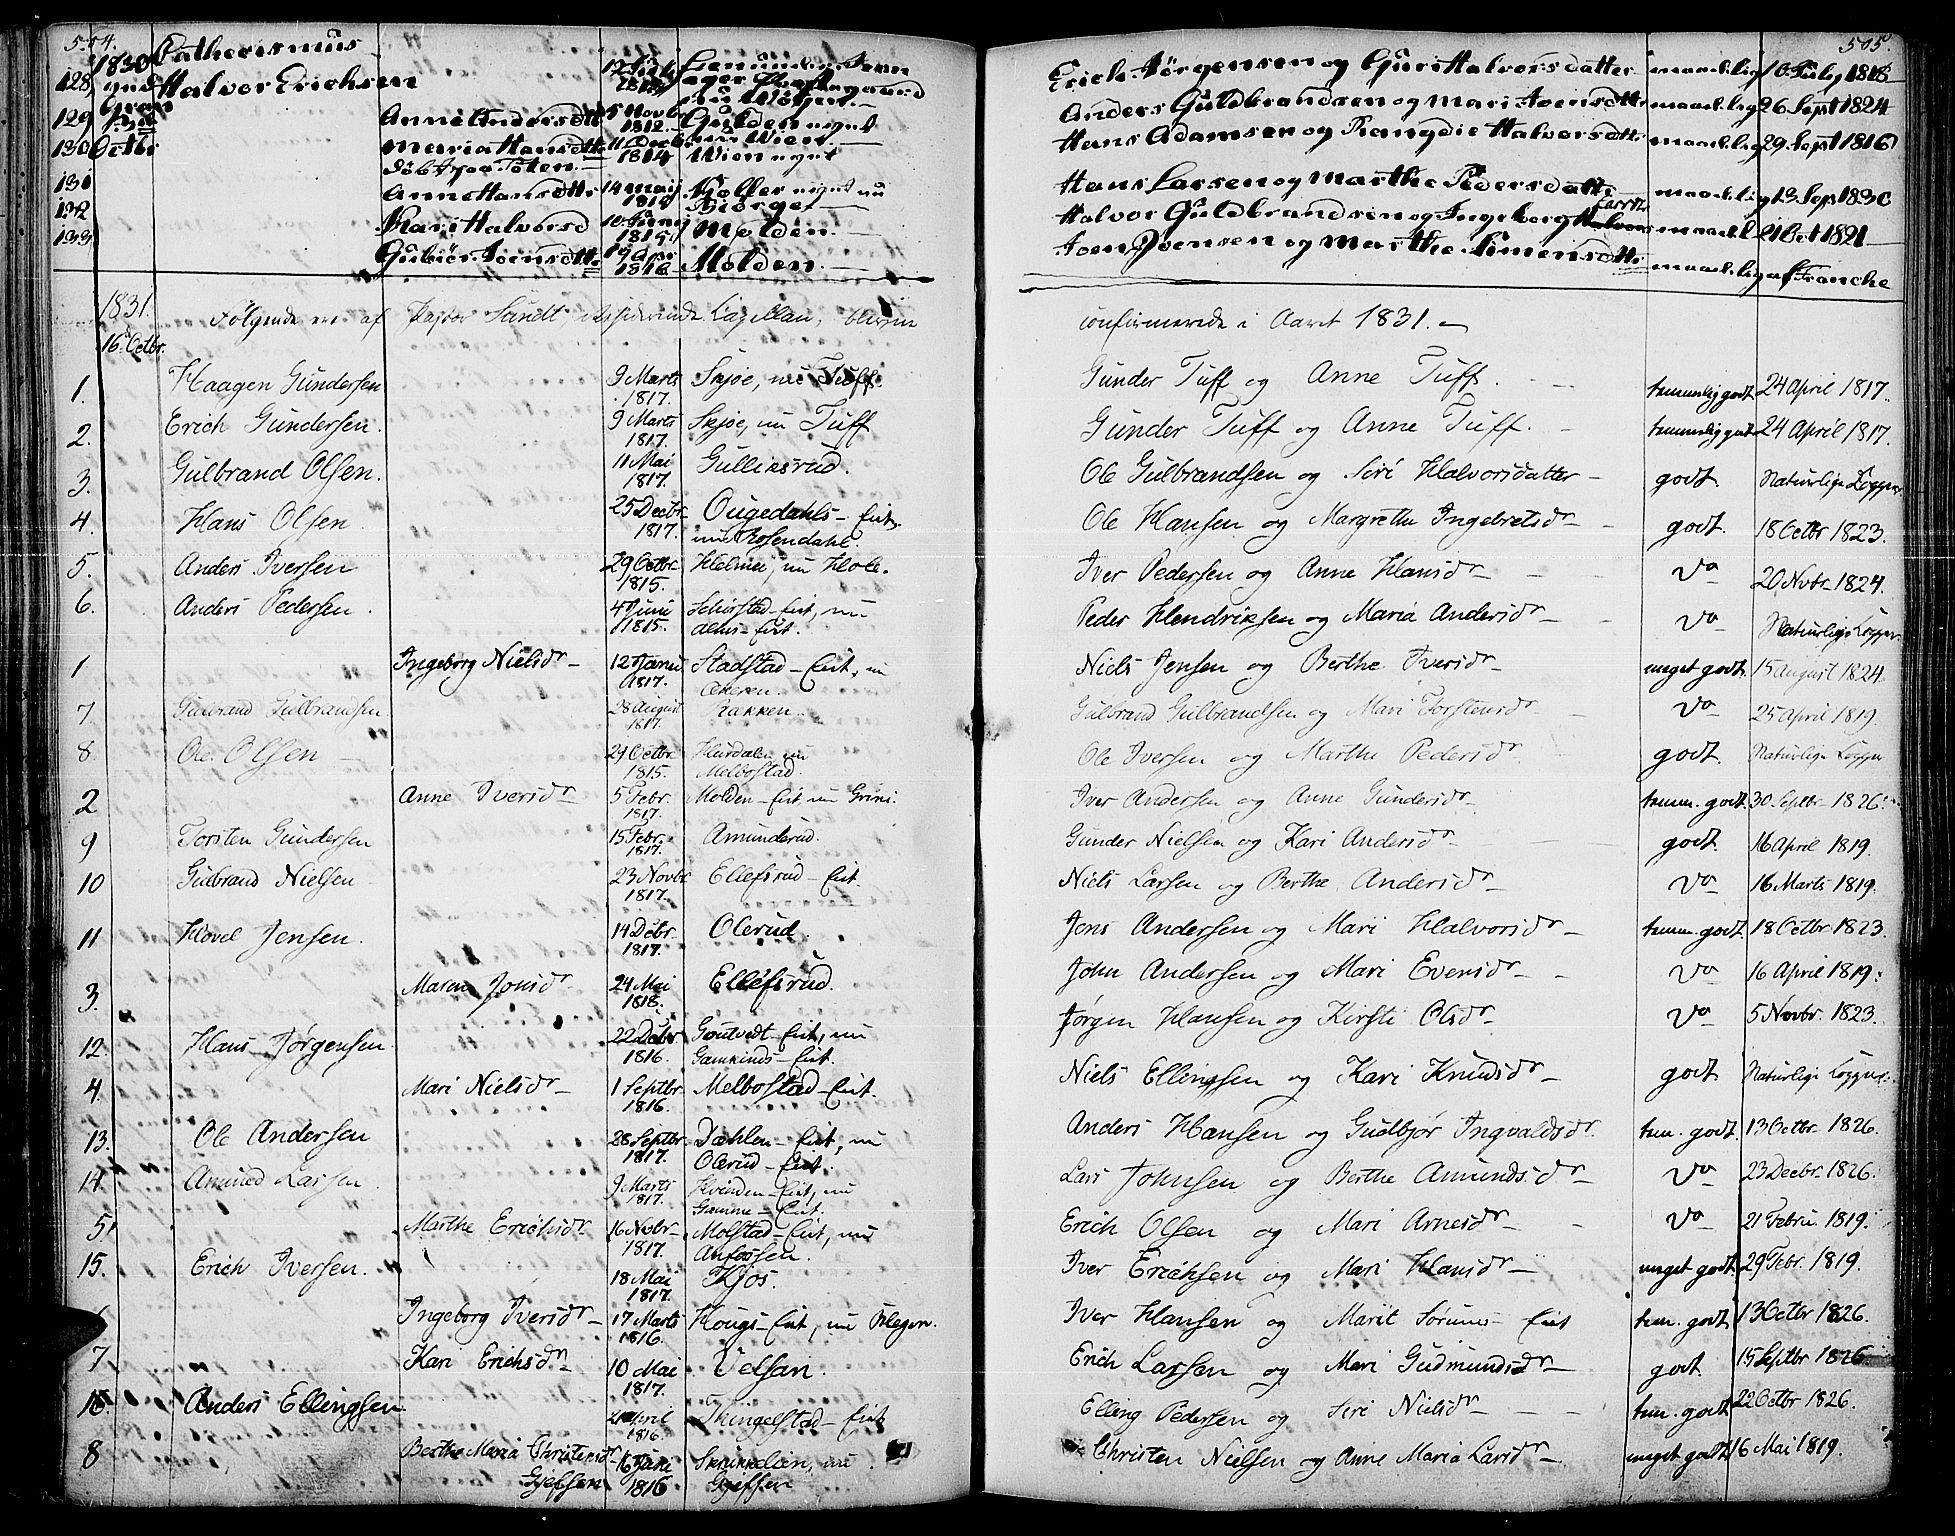 SAH, Gran prestekontor, Parish register (official) no. 10, 1824-1842, p. 504-505